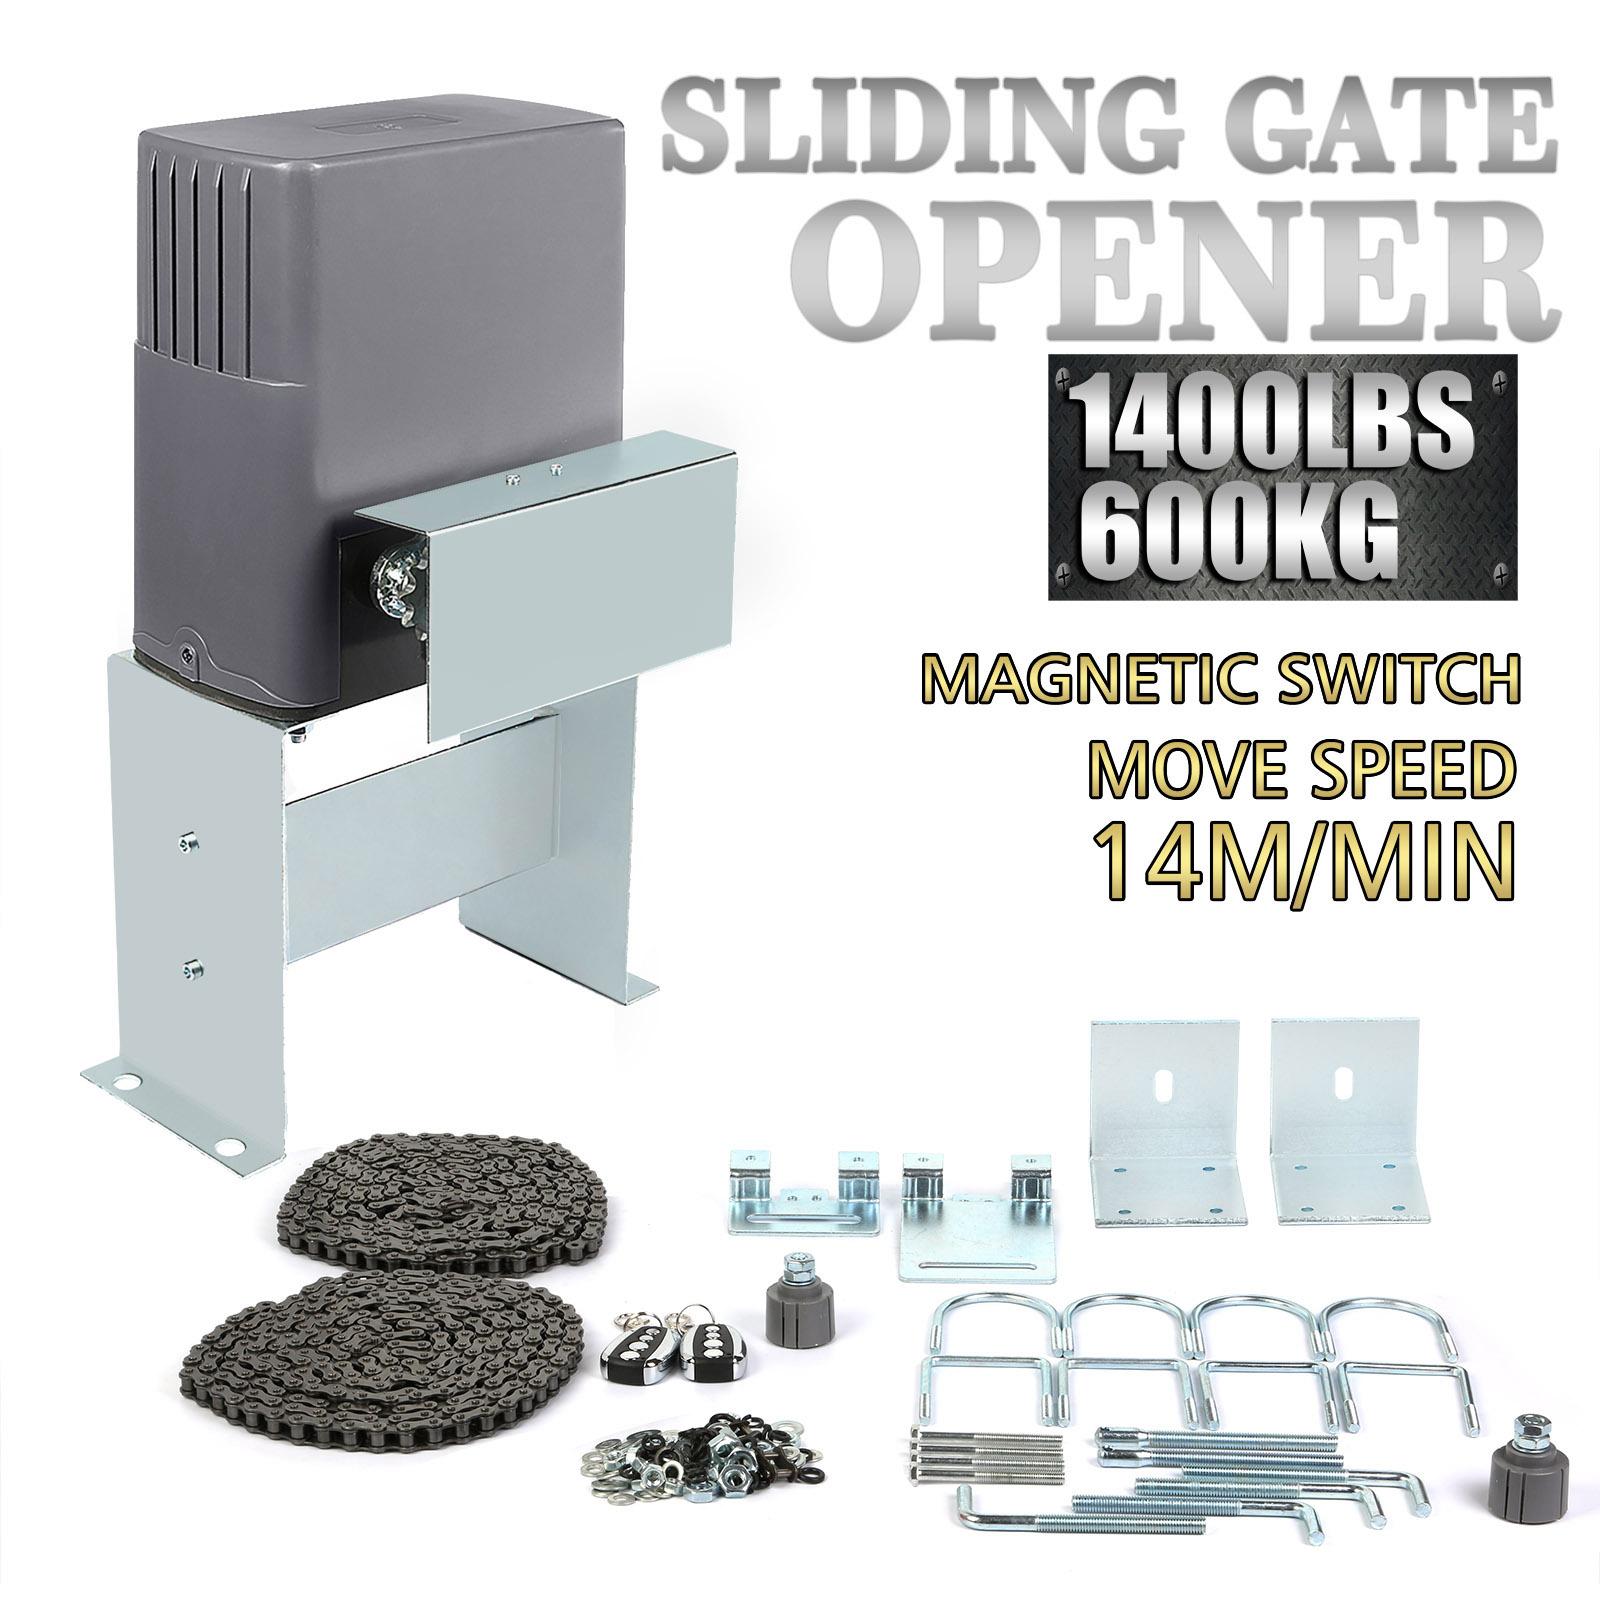 Accessories for sliding gates: types, prices, photos 100